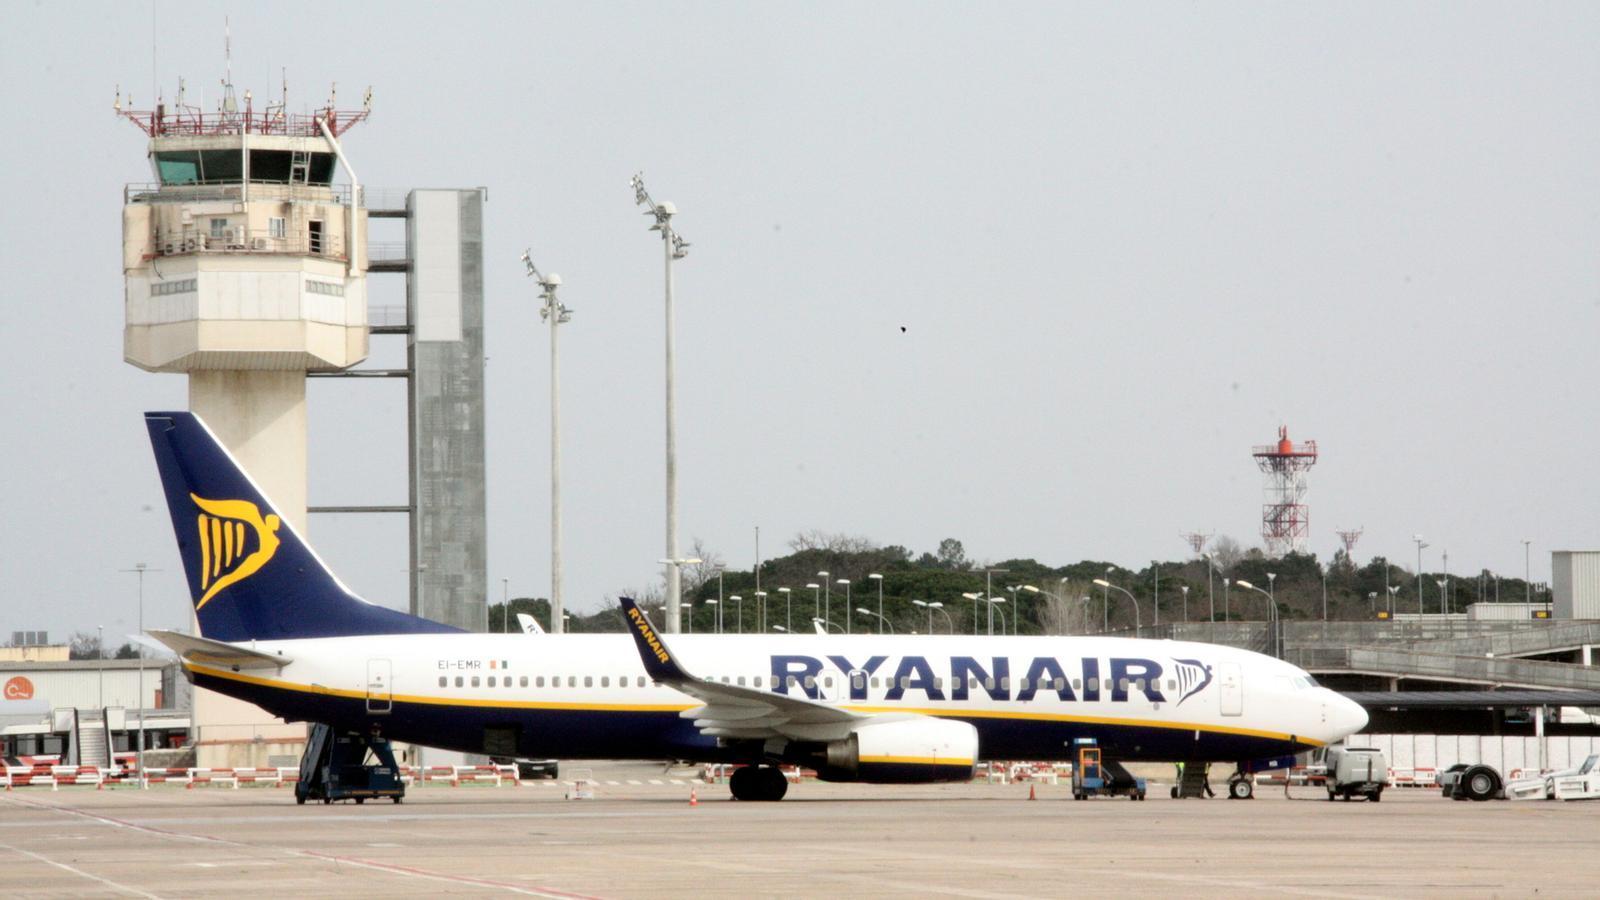 Alarma sindical per la possibilitat que Ryanair abandoni Girona